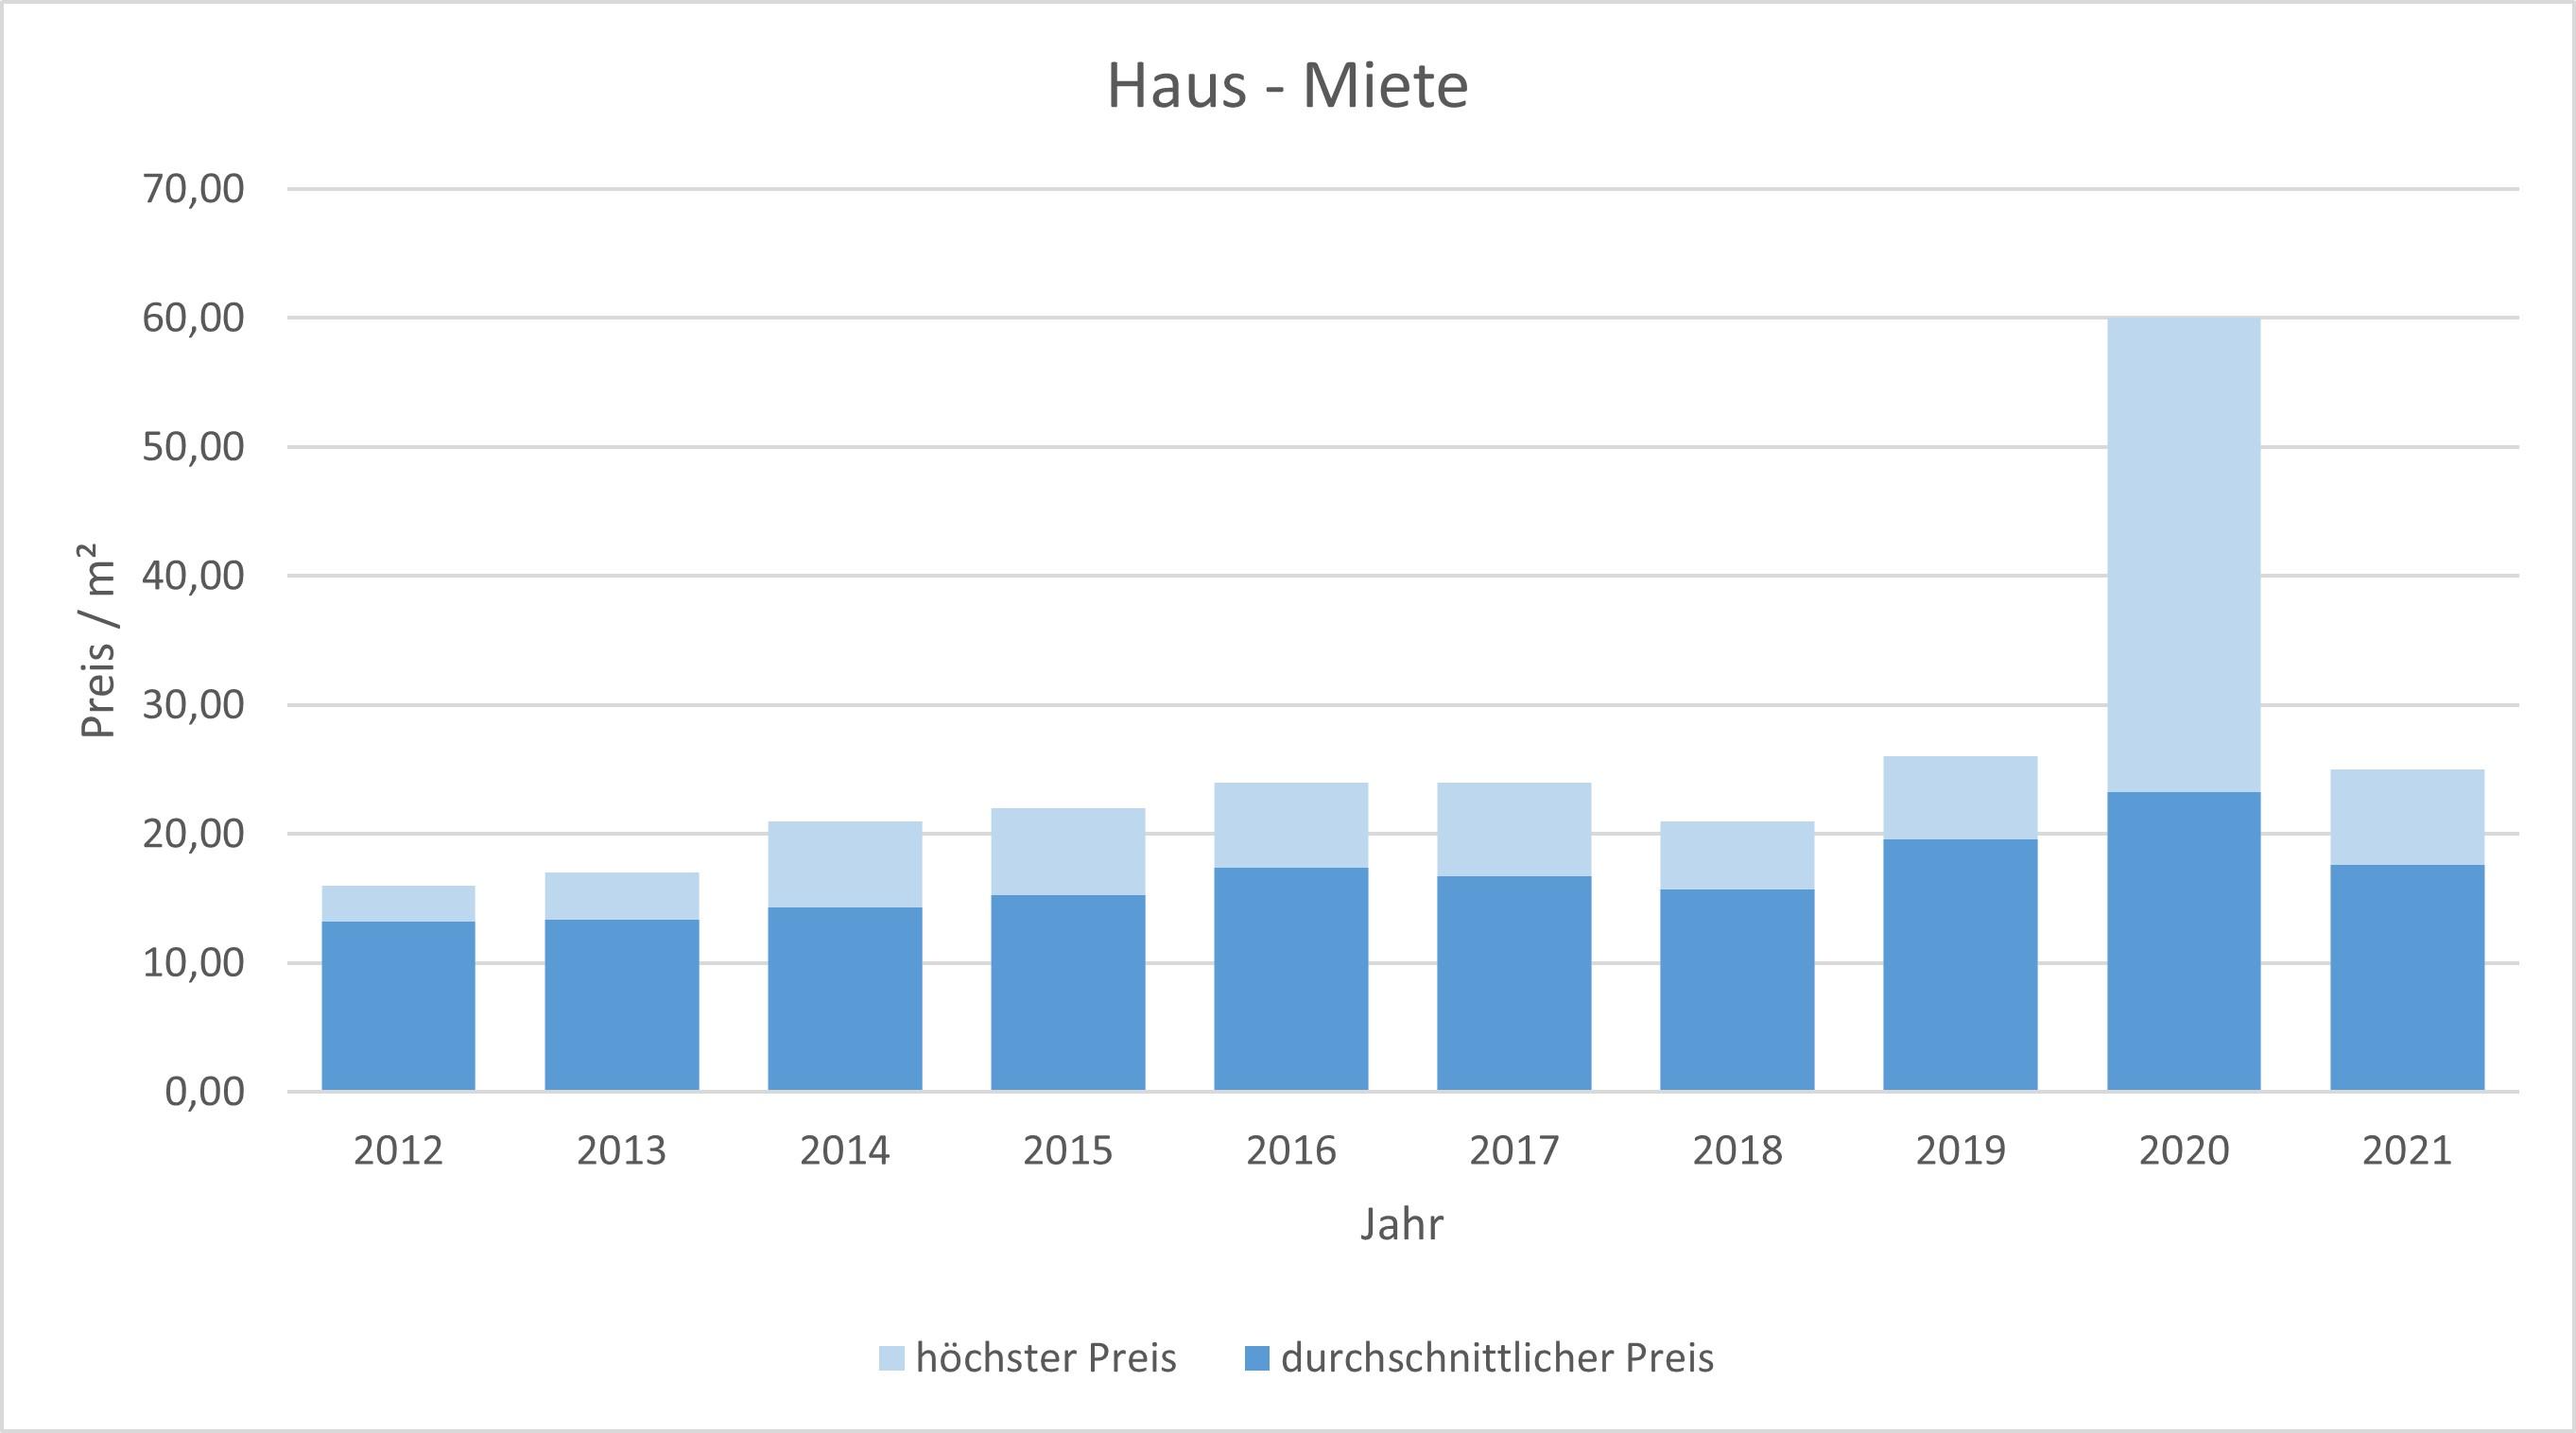 München - Milbertshofen - Am Hart Haus mieten vermieten Preis Bewertung Makler 2019 2020 2021 www.happy-immo.de